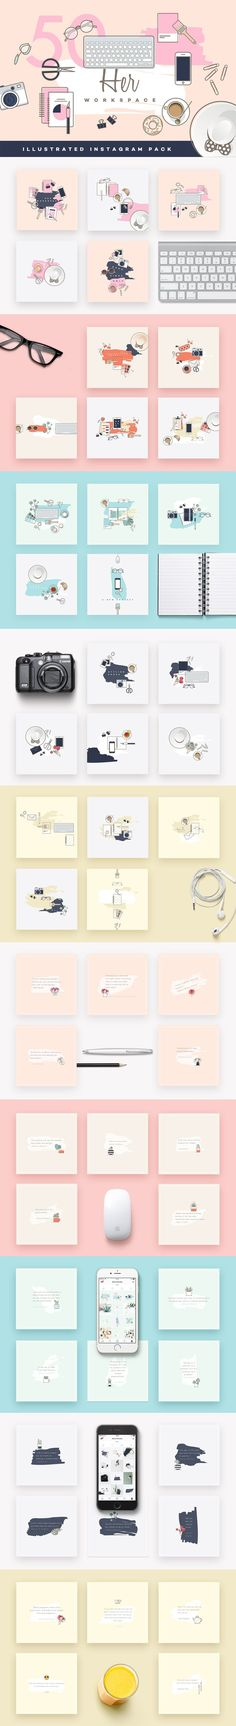 Her Workspace illustrated Insta pack by Polar Vectors on @creativemarket  #ad #affiliatelink #affiliate #font #design #templates #blogger #blog #creative #feminine #girlboss #instagram #socialmedia